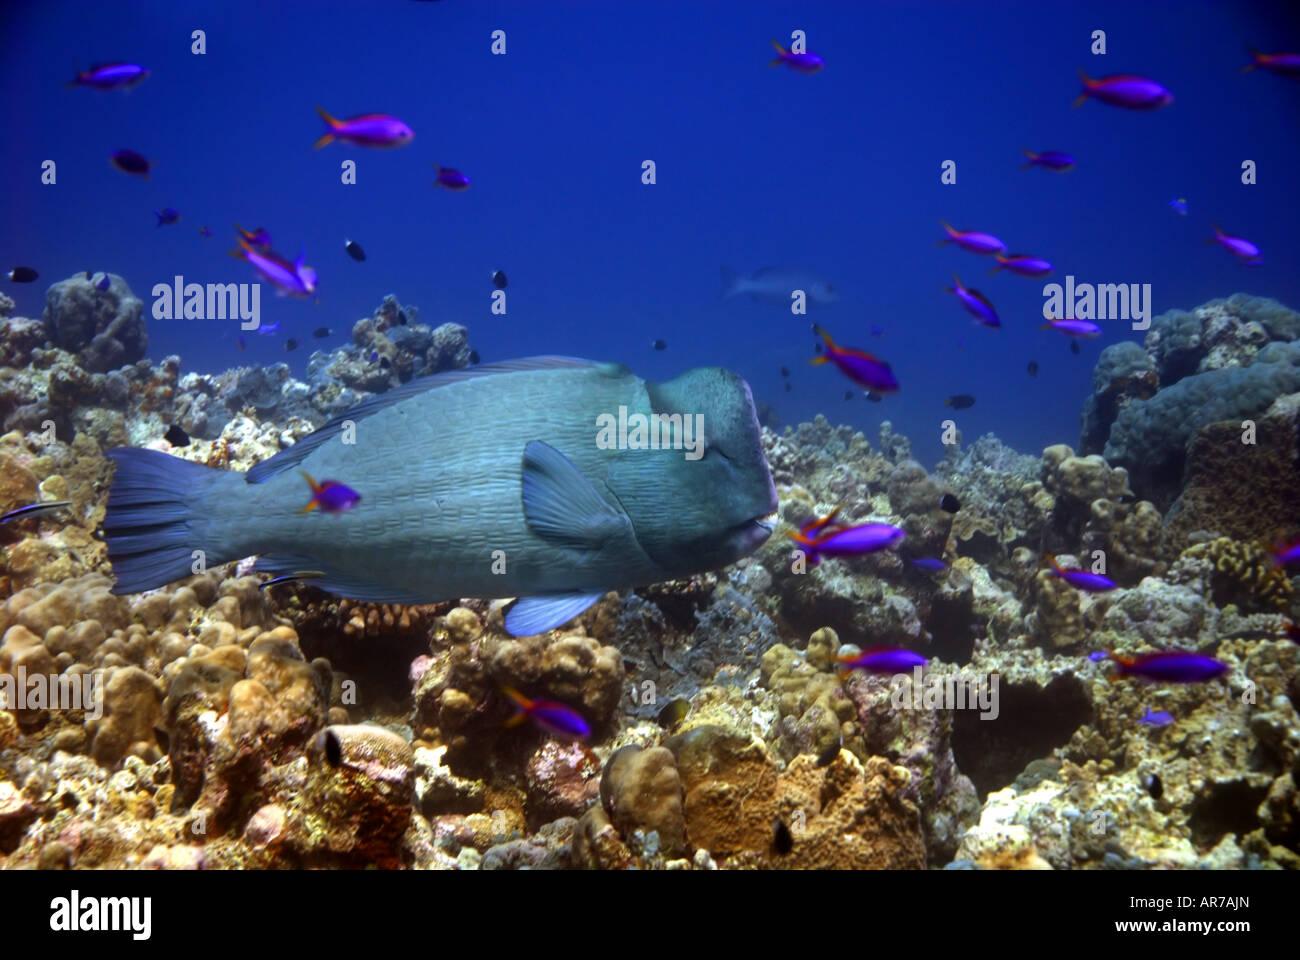 Bumphead parrotfish (Bolbometopon muricatum), Mermaid Reef, Rowley Shoals, Western Australia Stock Photo